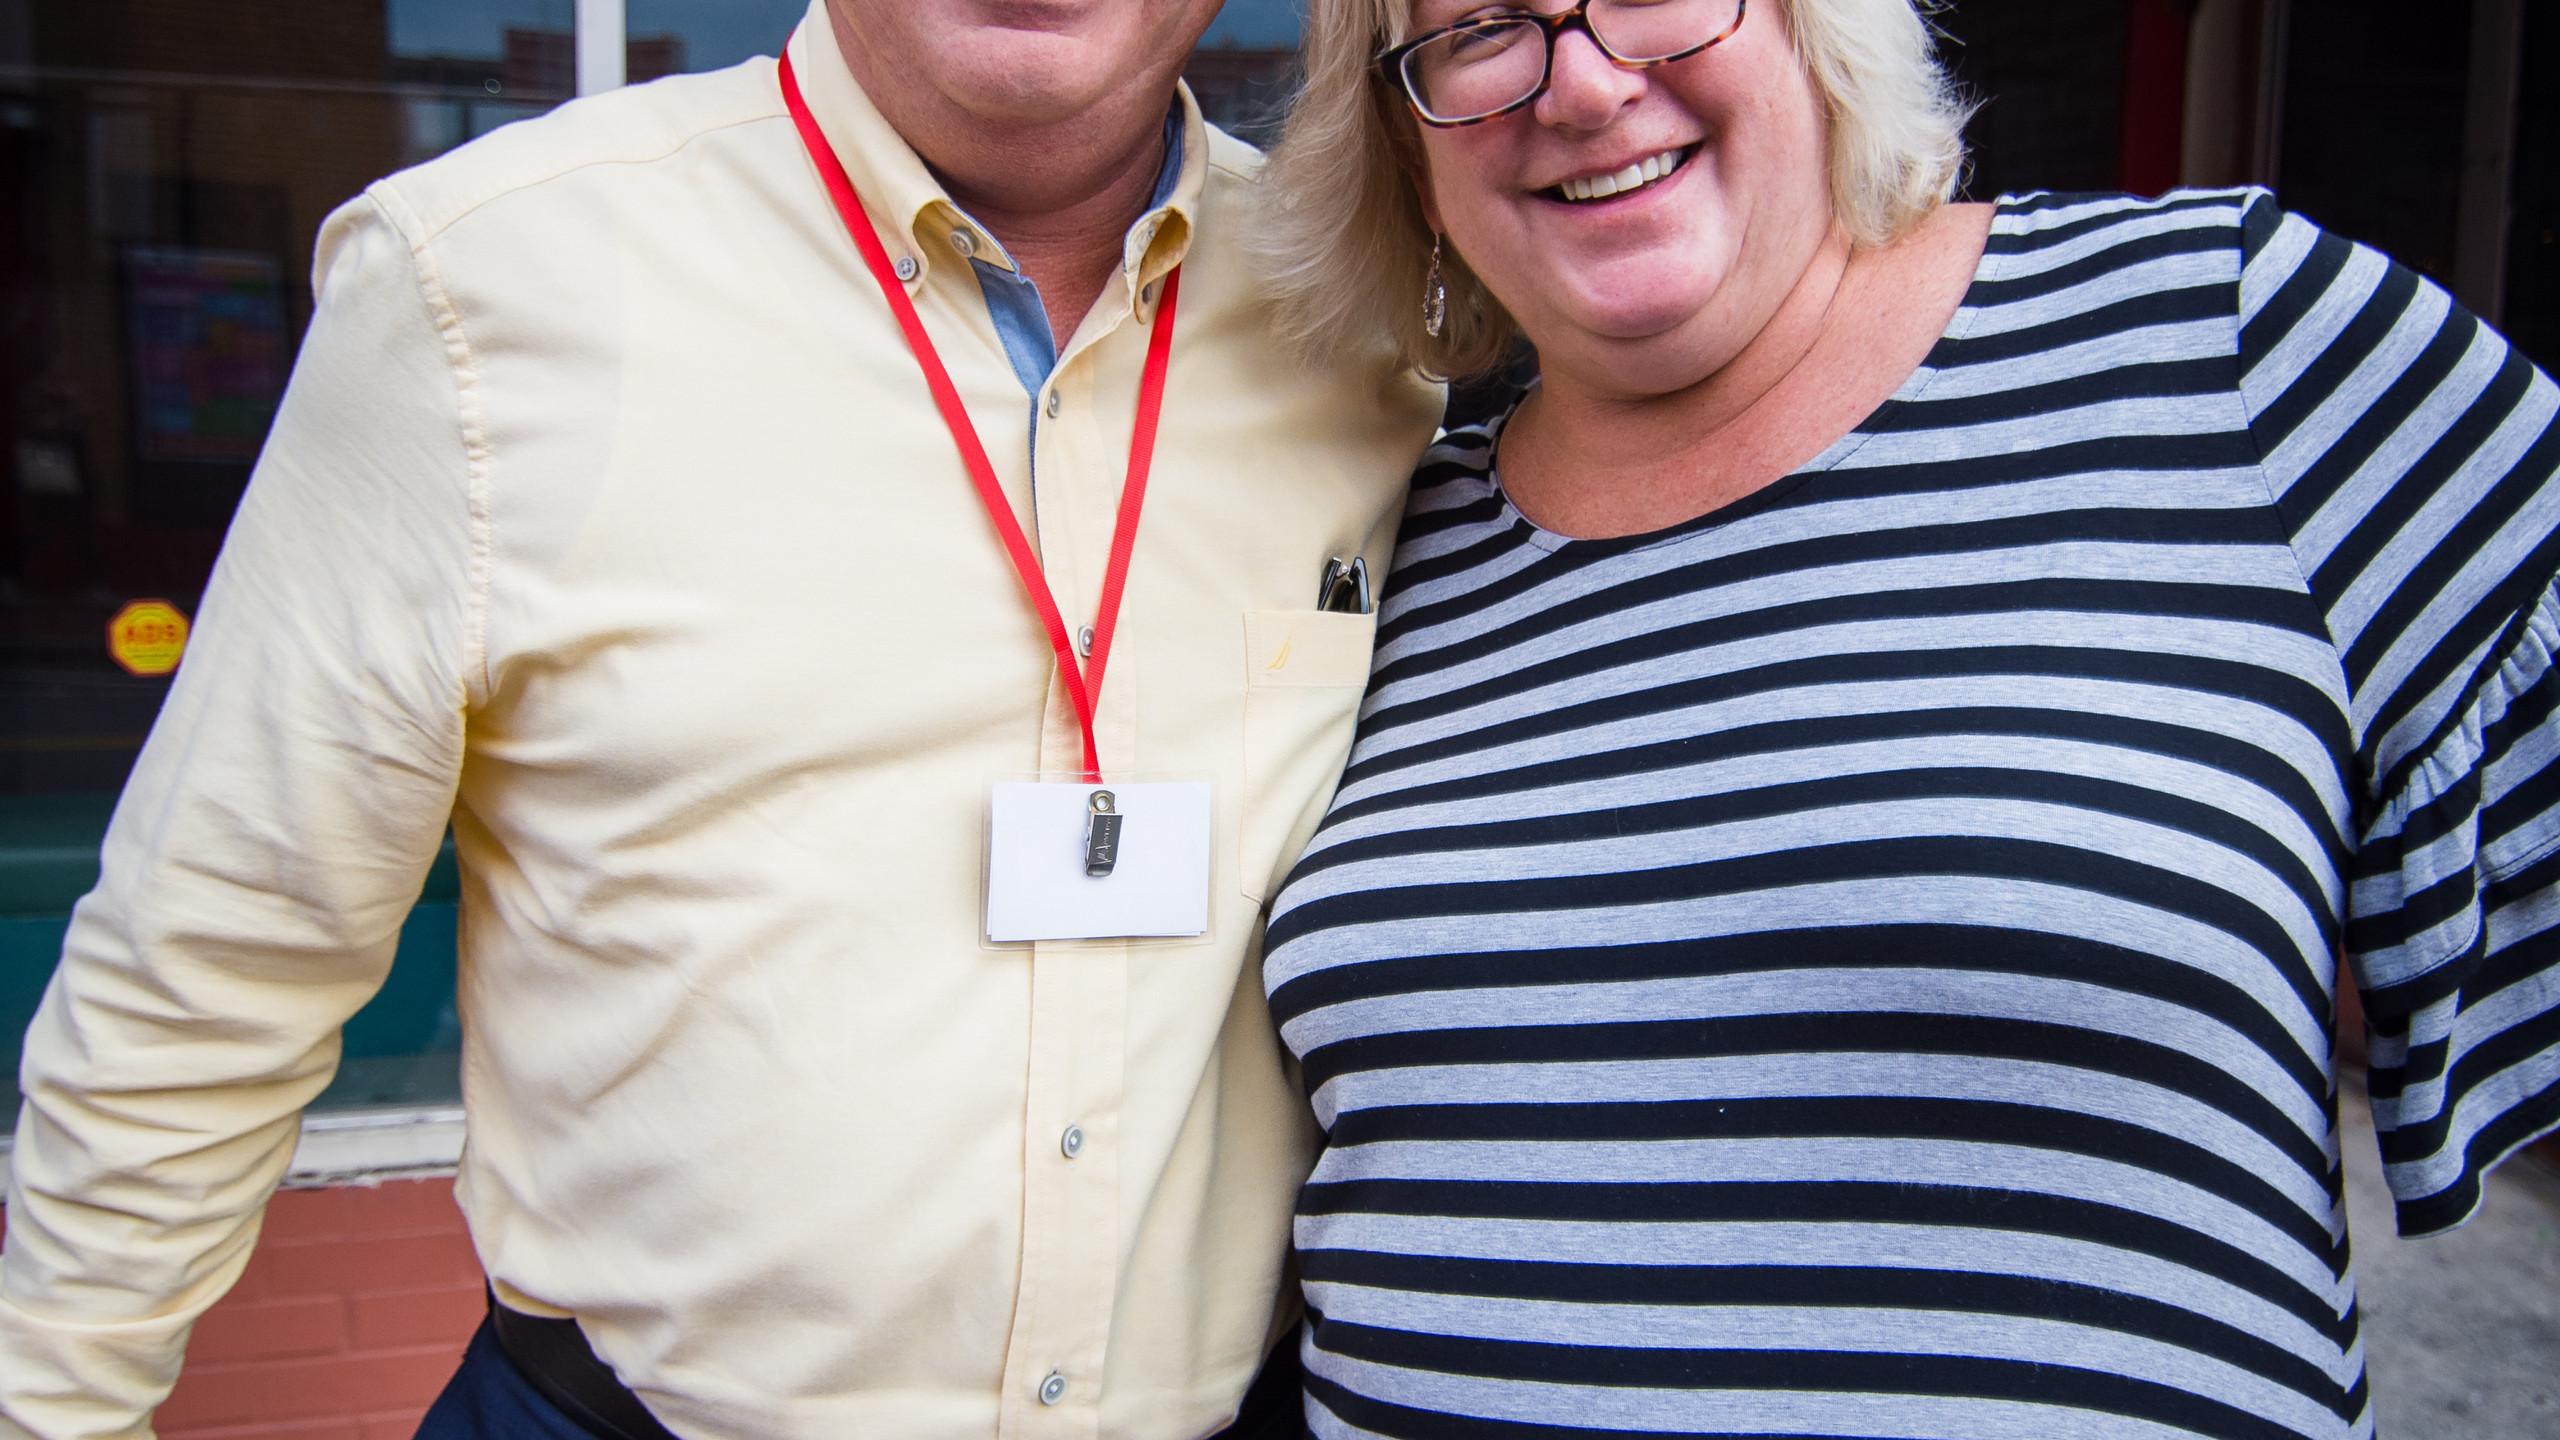 Jeff Harris and Melissa Schaffner